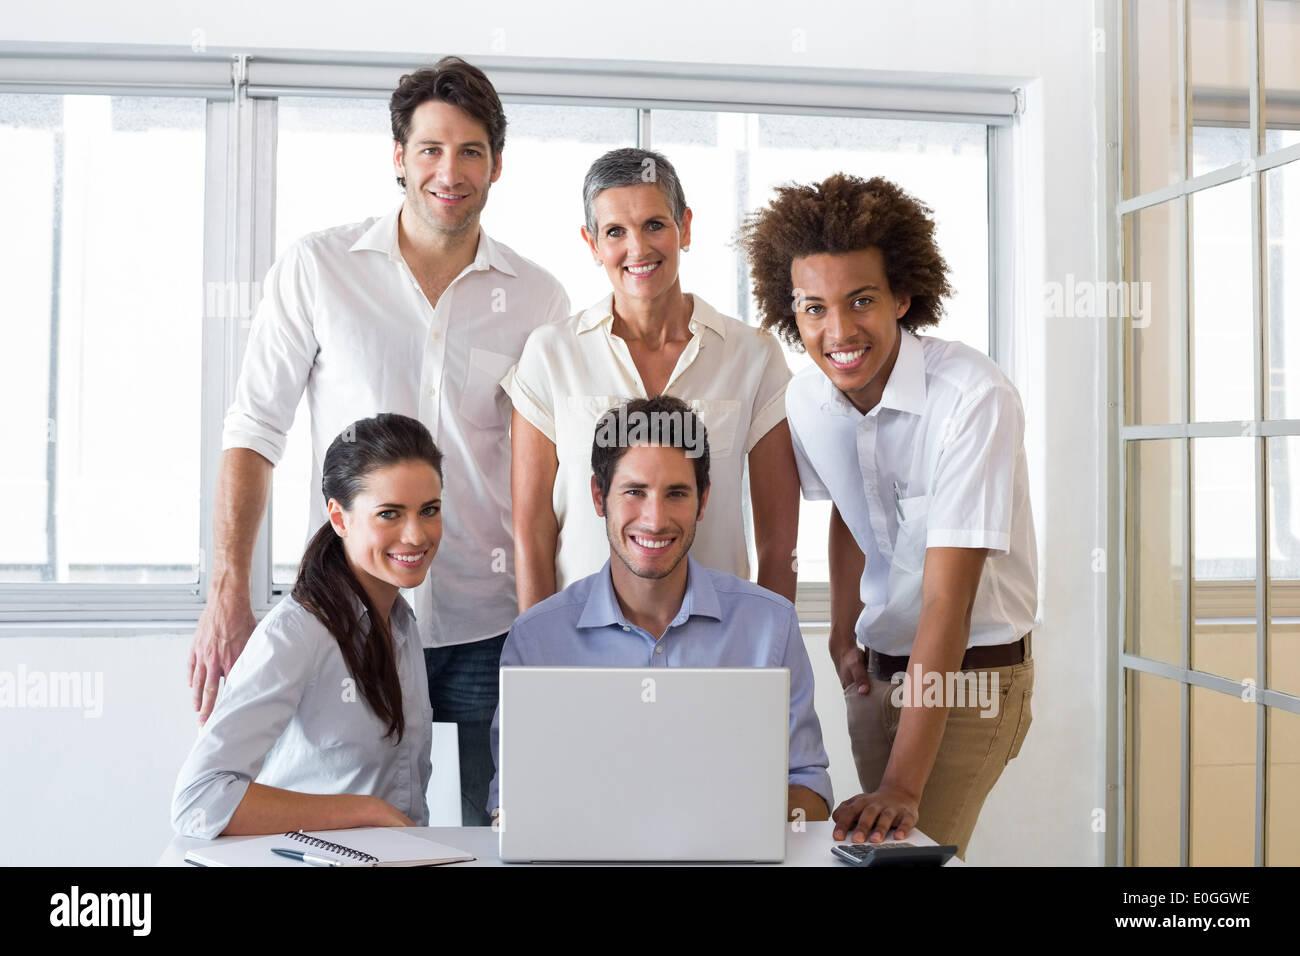 Attraktive Business-Leute lächelnd am Arbeitsplatz Stockbild